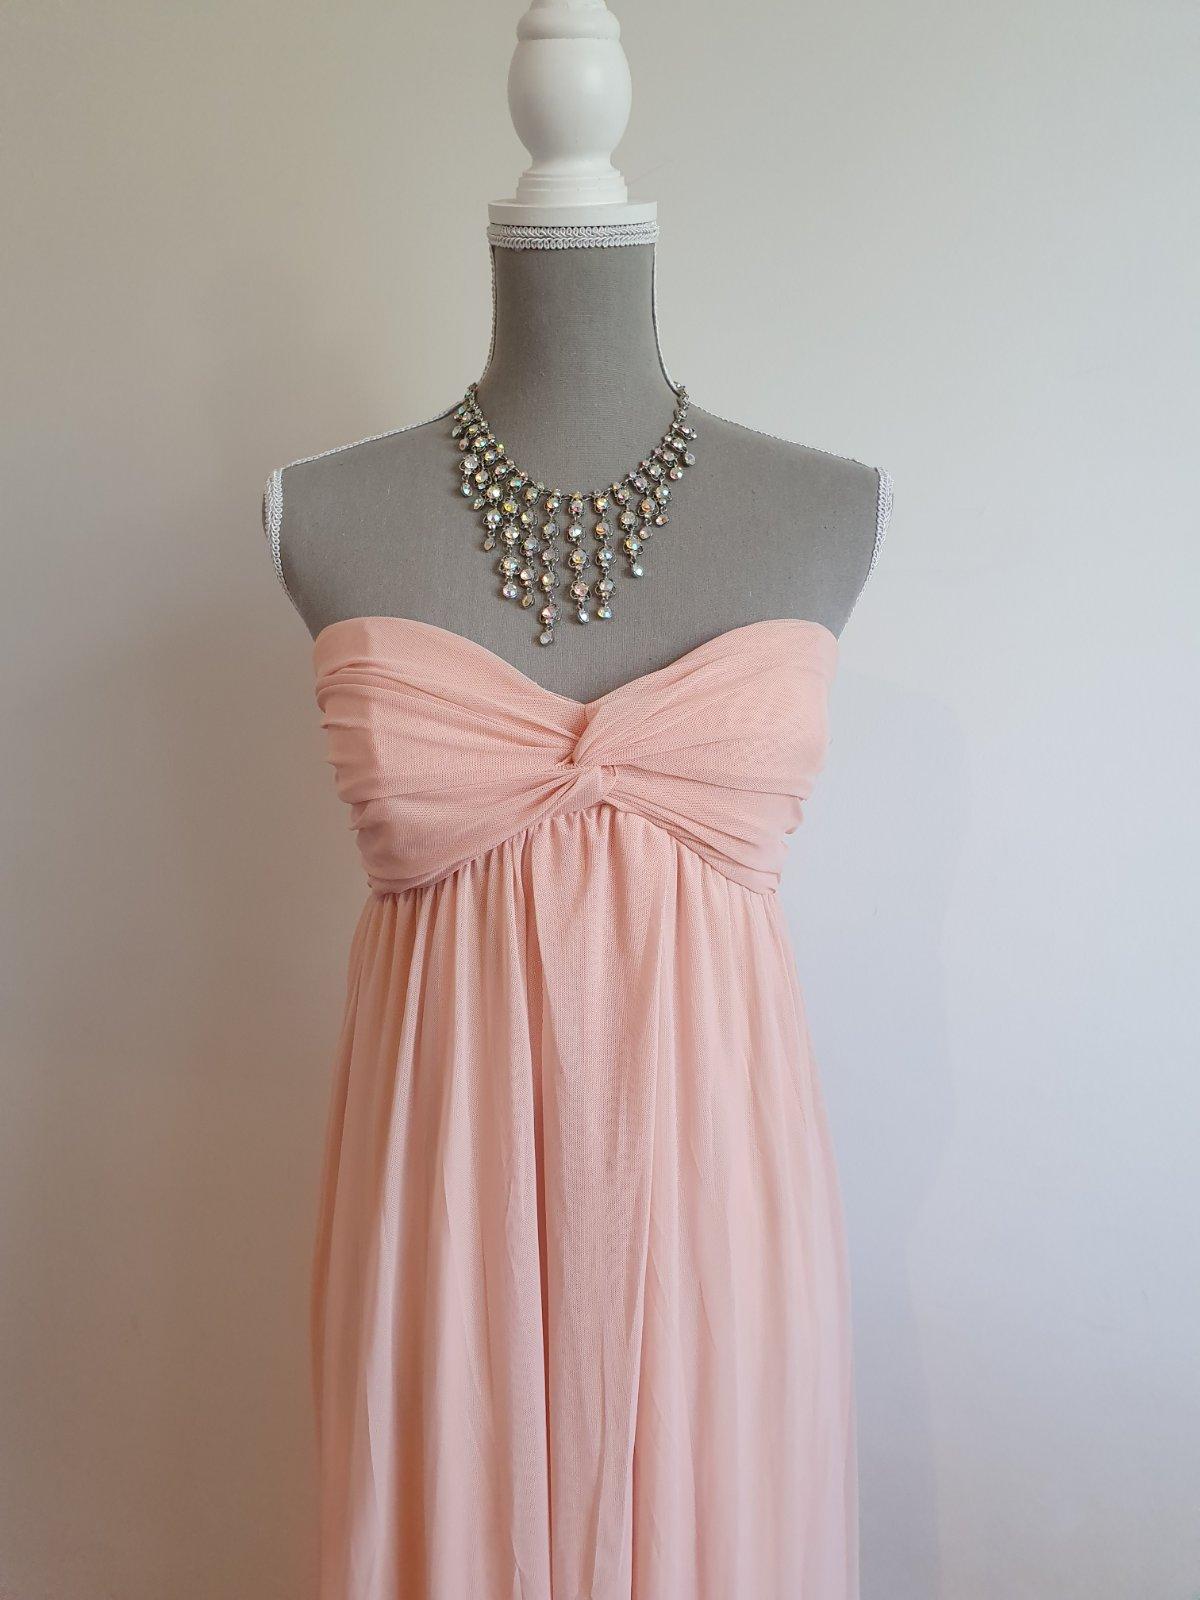 lahulinké šaty Tally Weijl - Obrázok č. 3